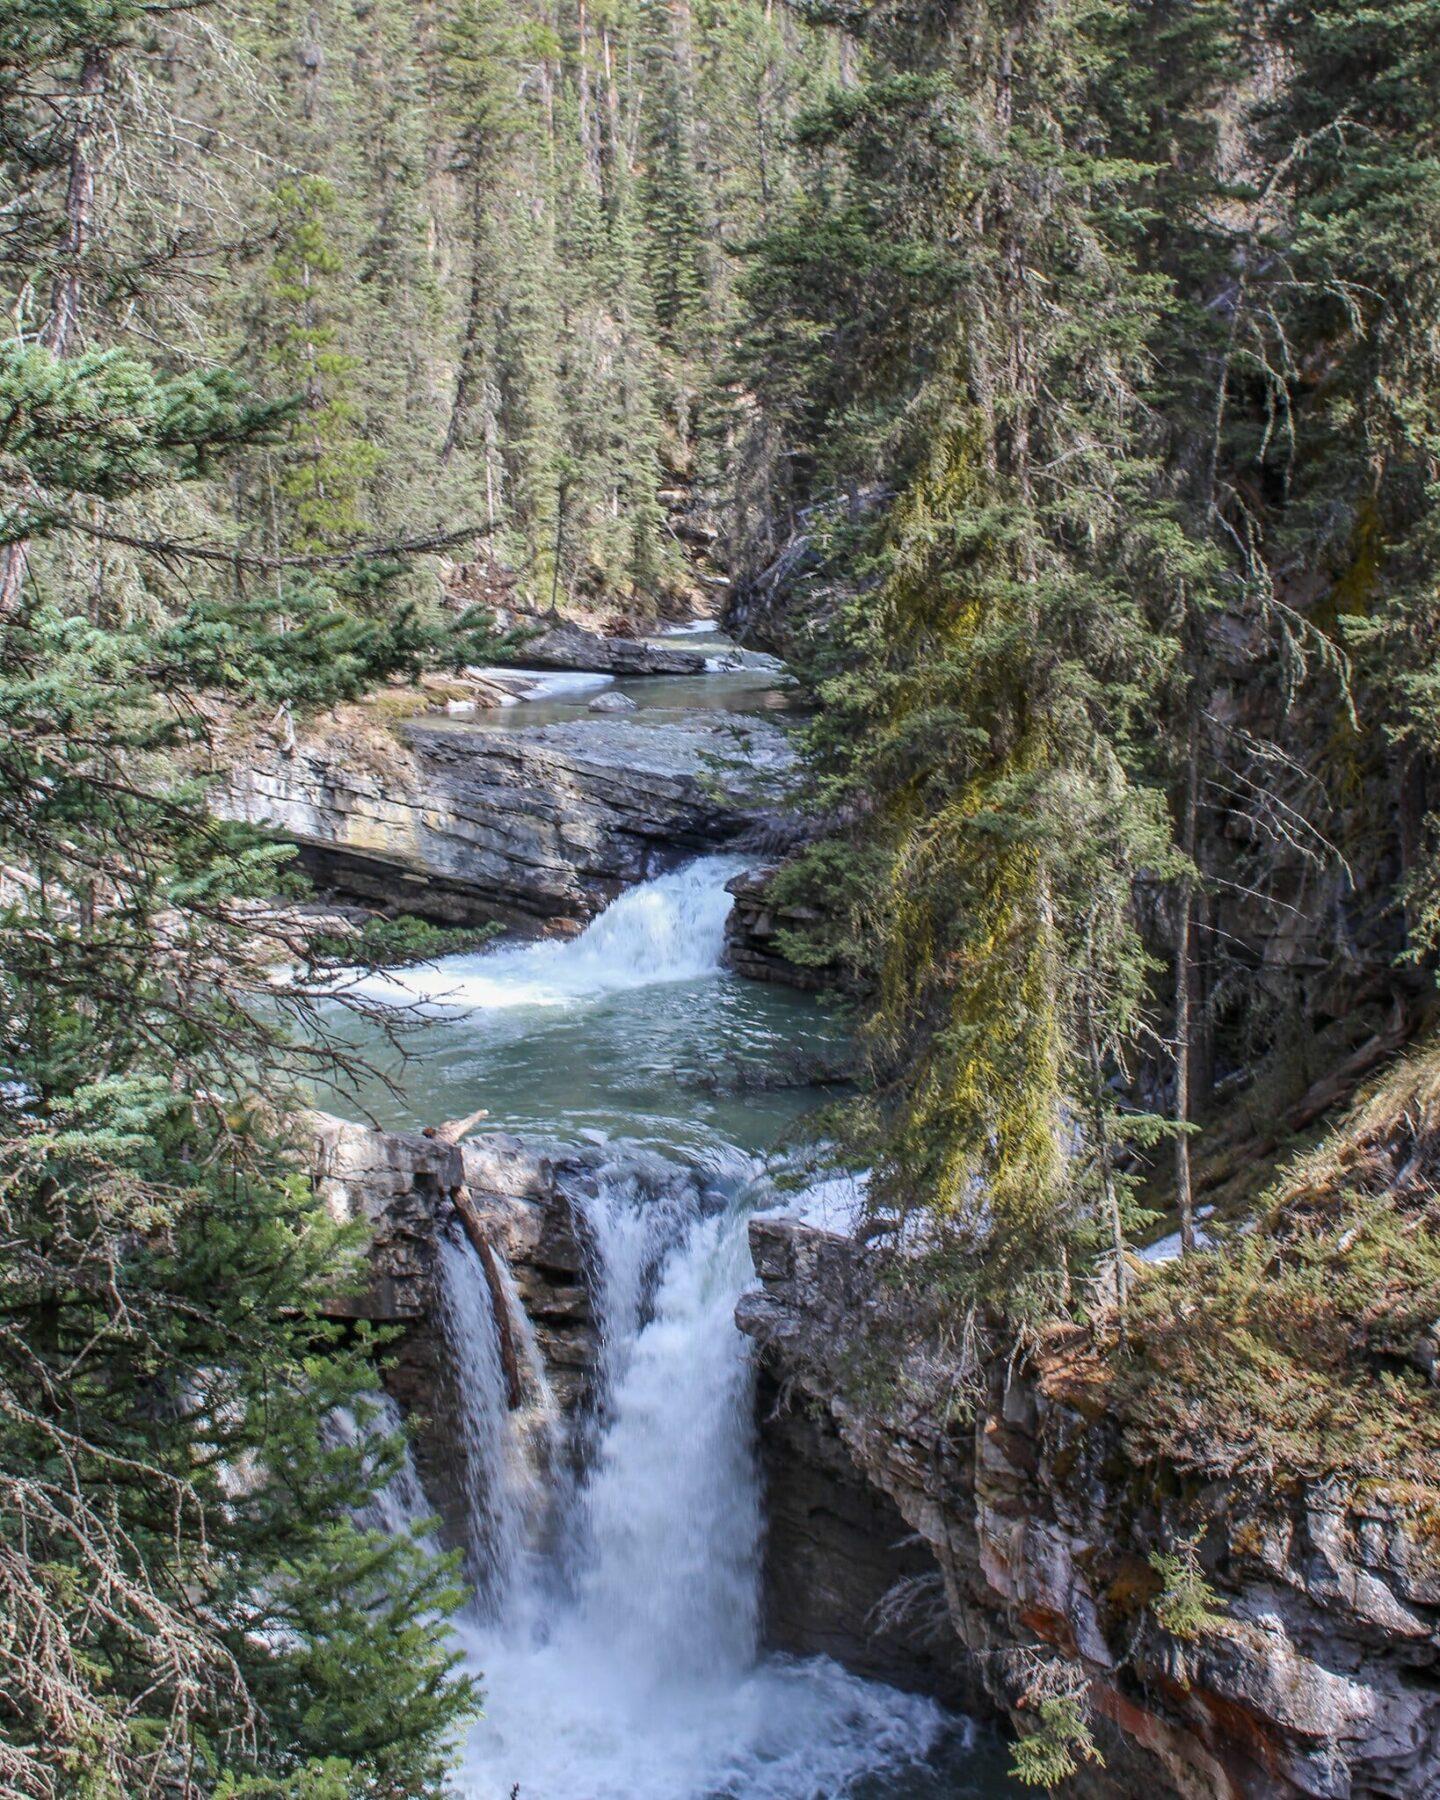 4 Days in Banff - Johnston Canyon Views